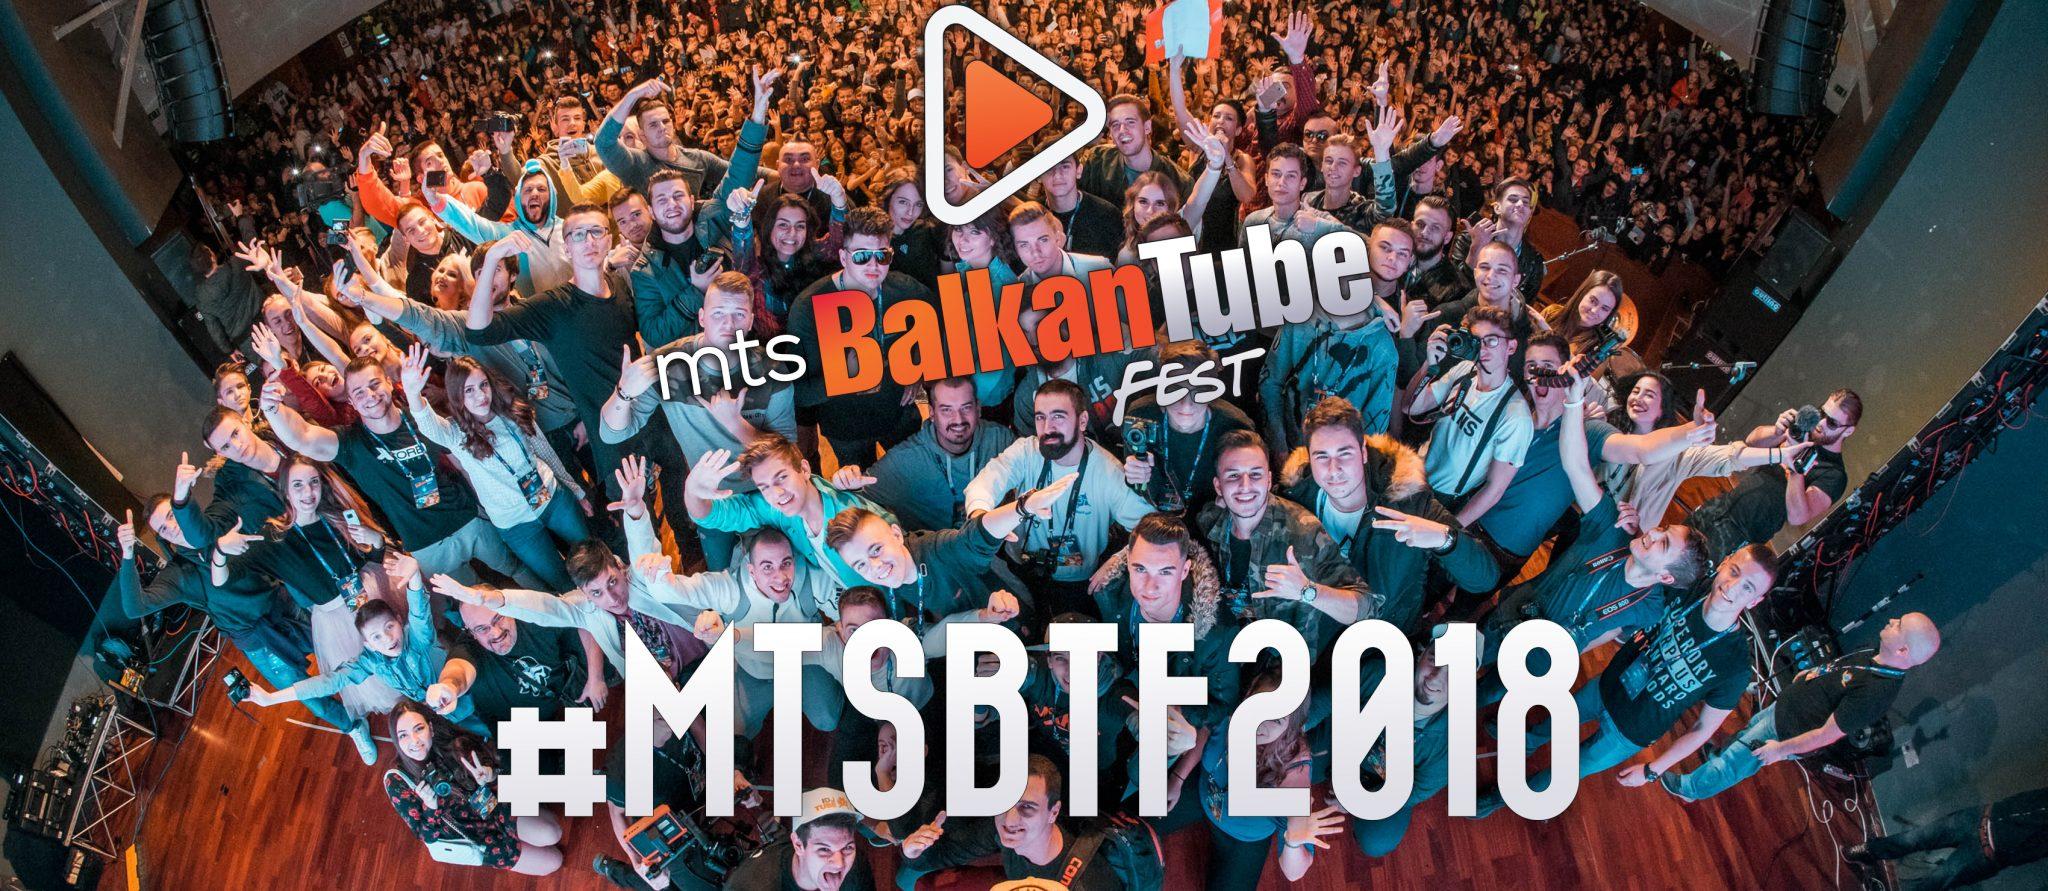 Balkan Tube Fest 20. i 30. septembar Kombank Dvorana, Beograd